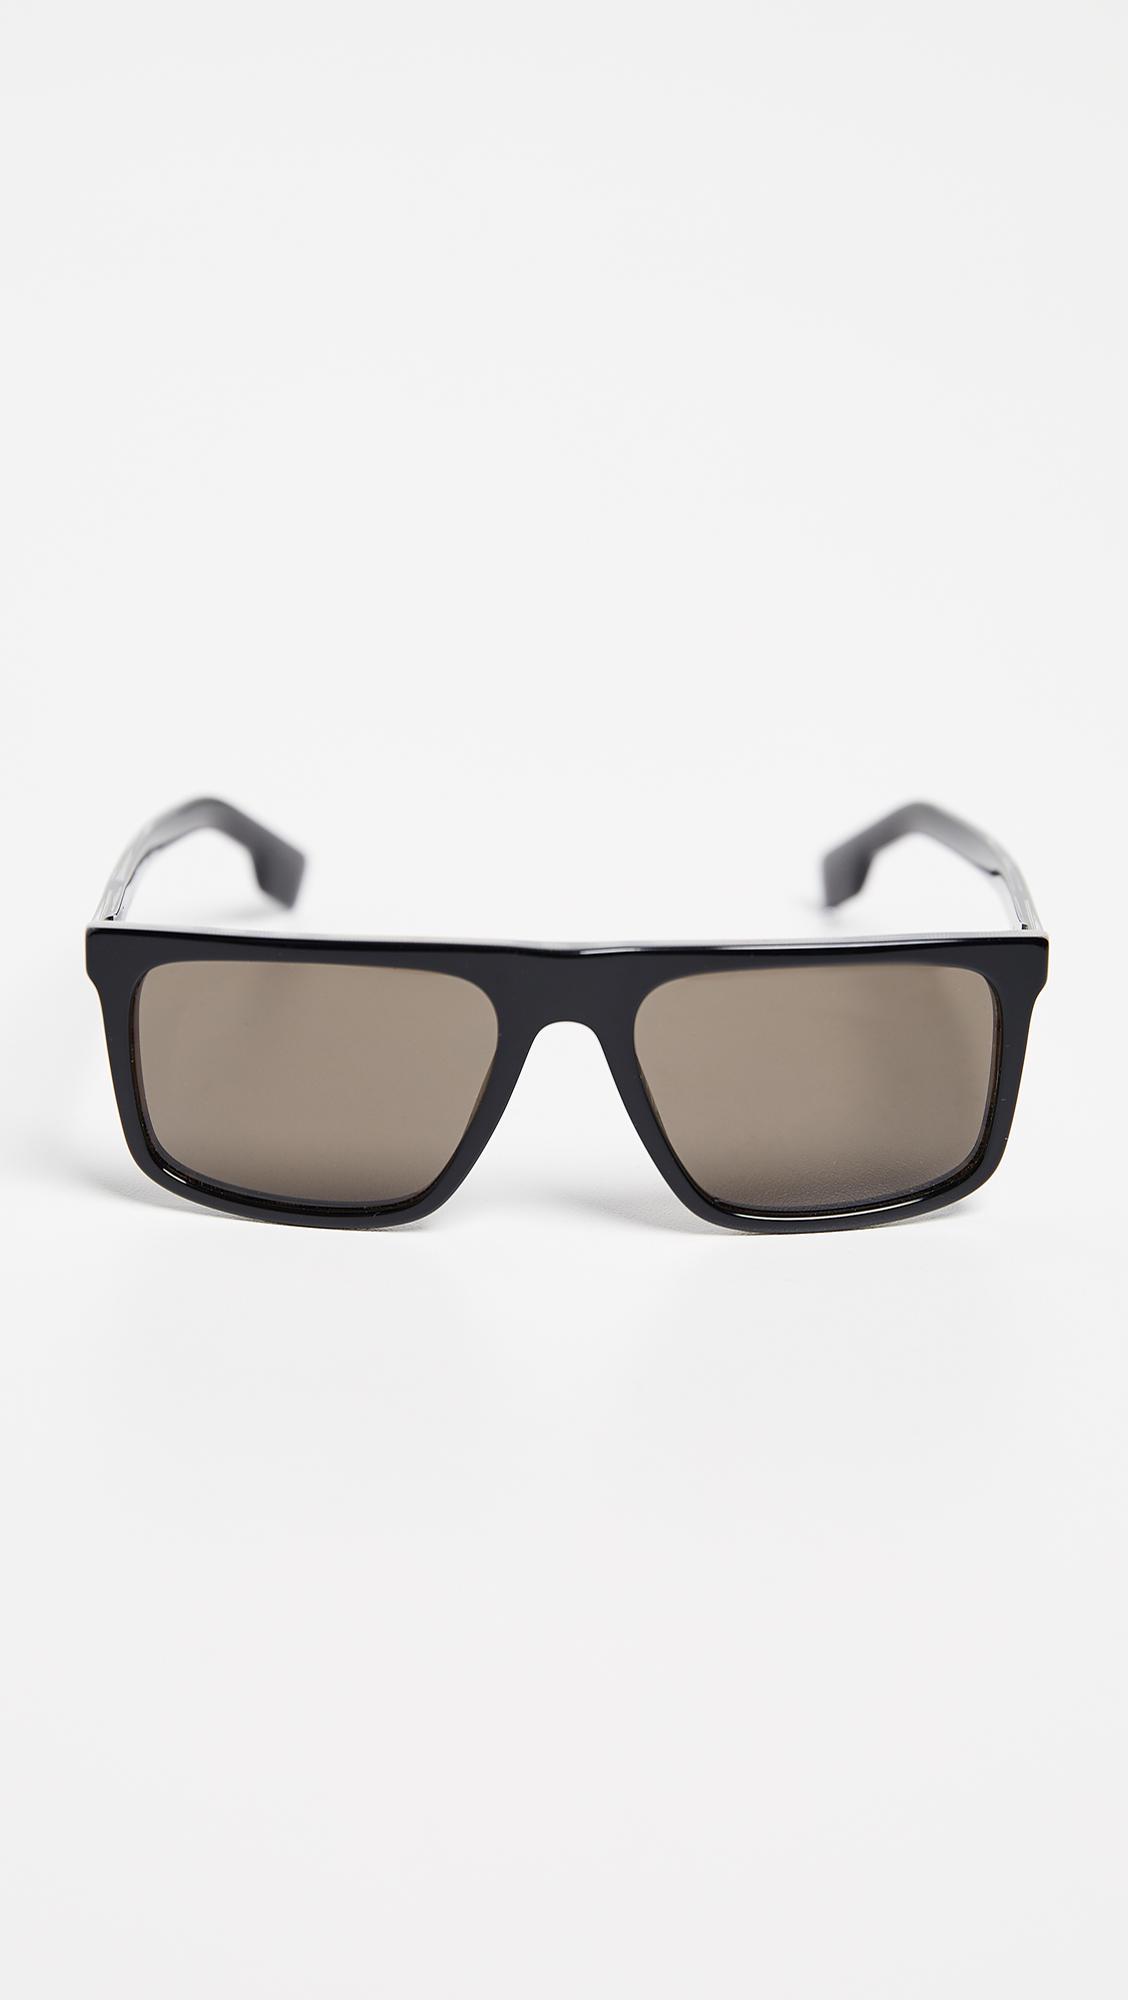 ff46f437236 Burberry Flat Top Sunglasses for Men - Lyst